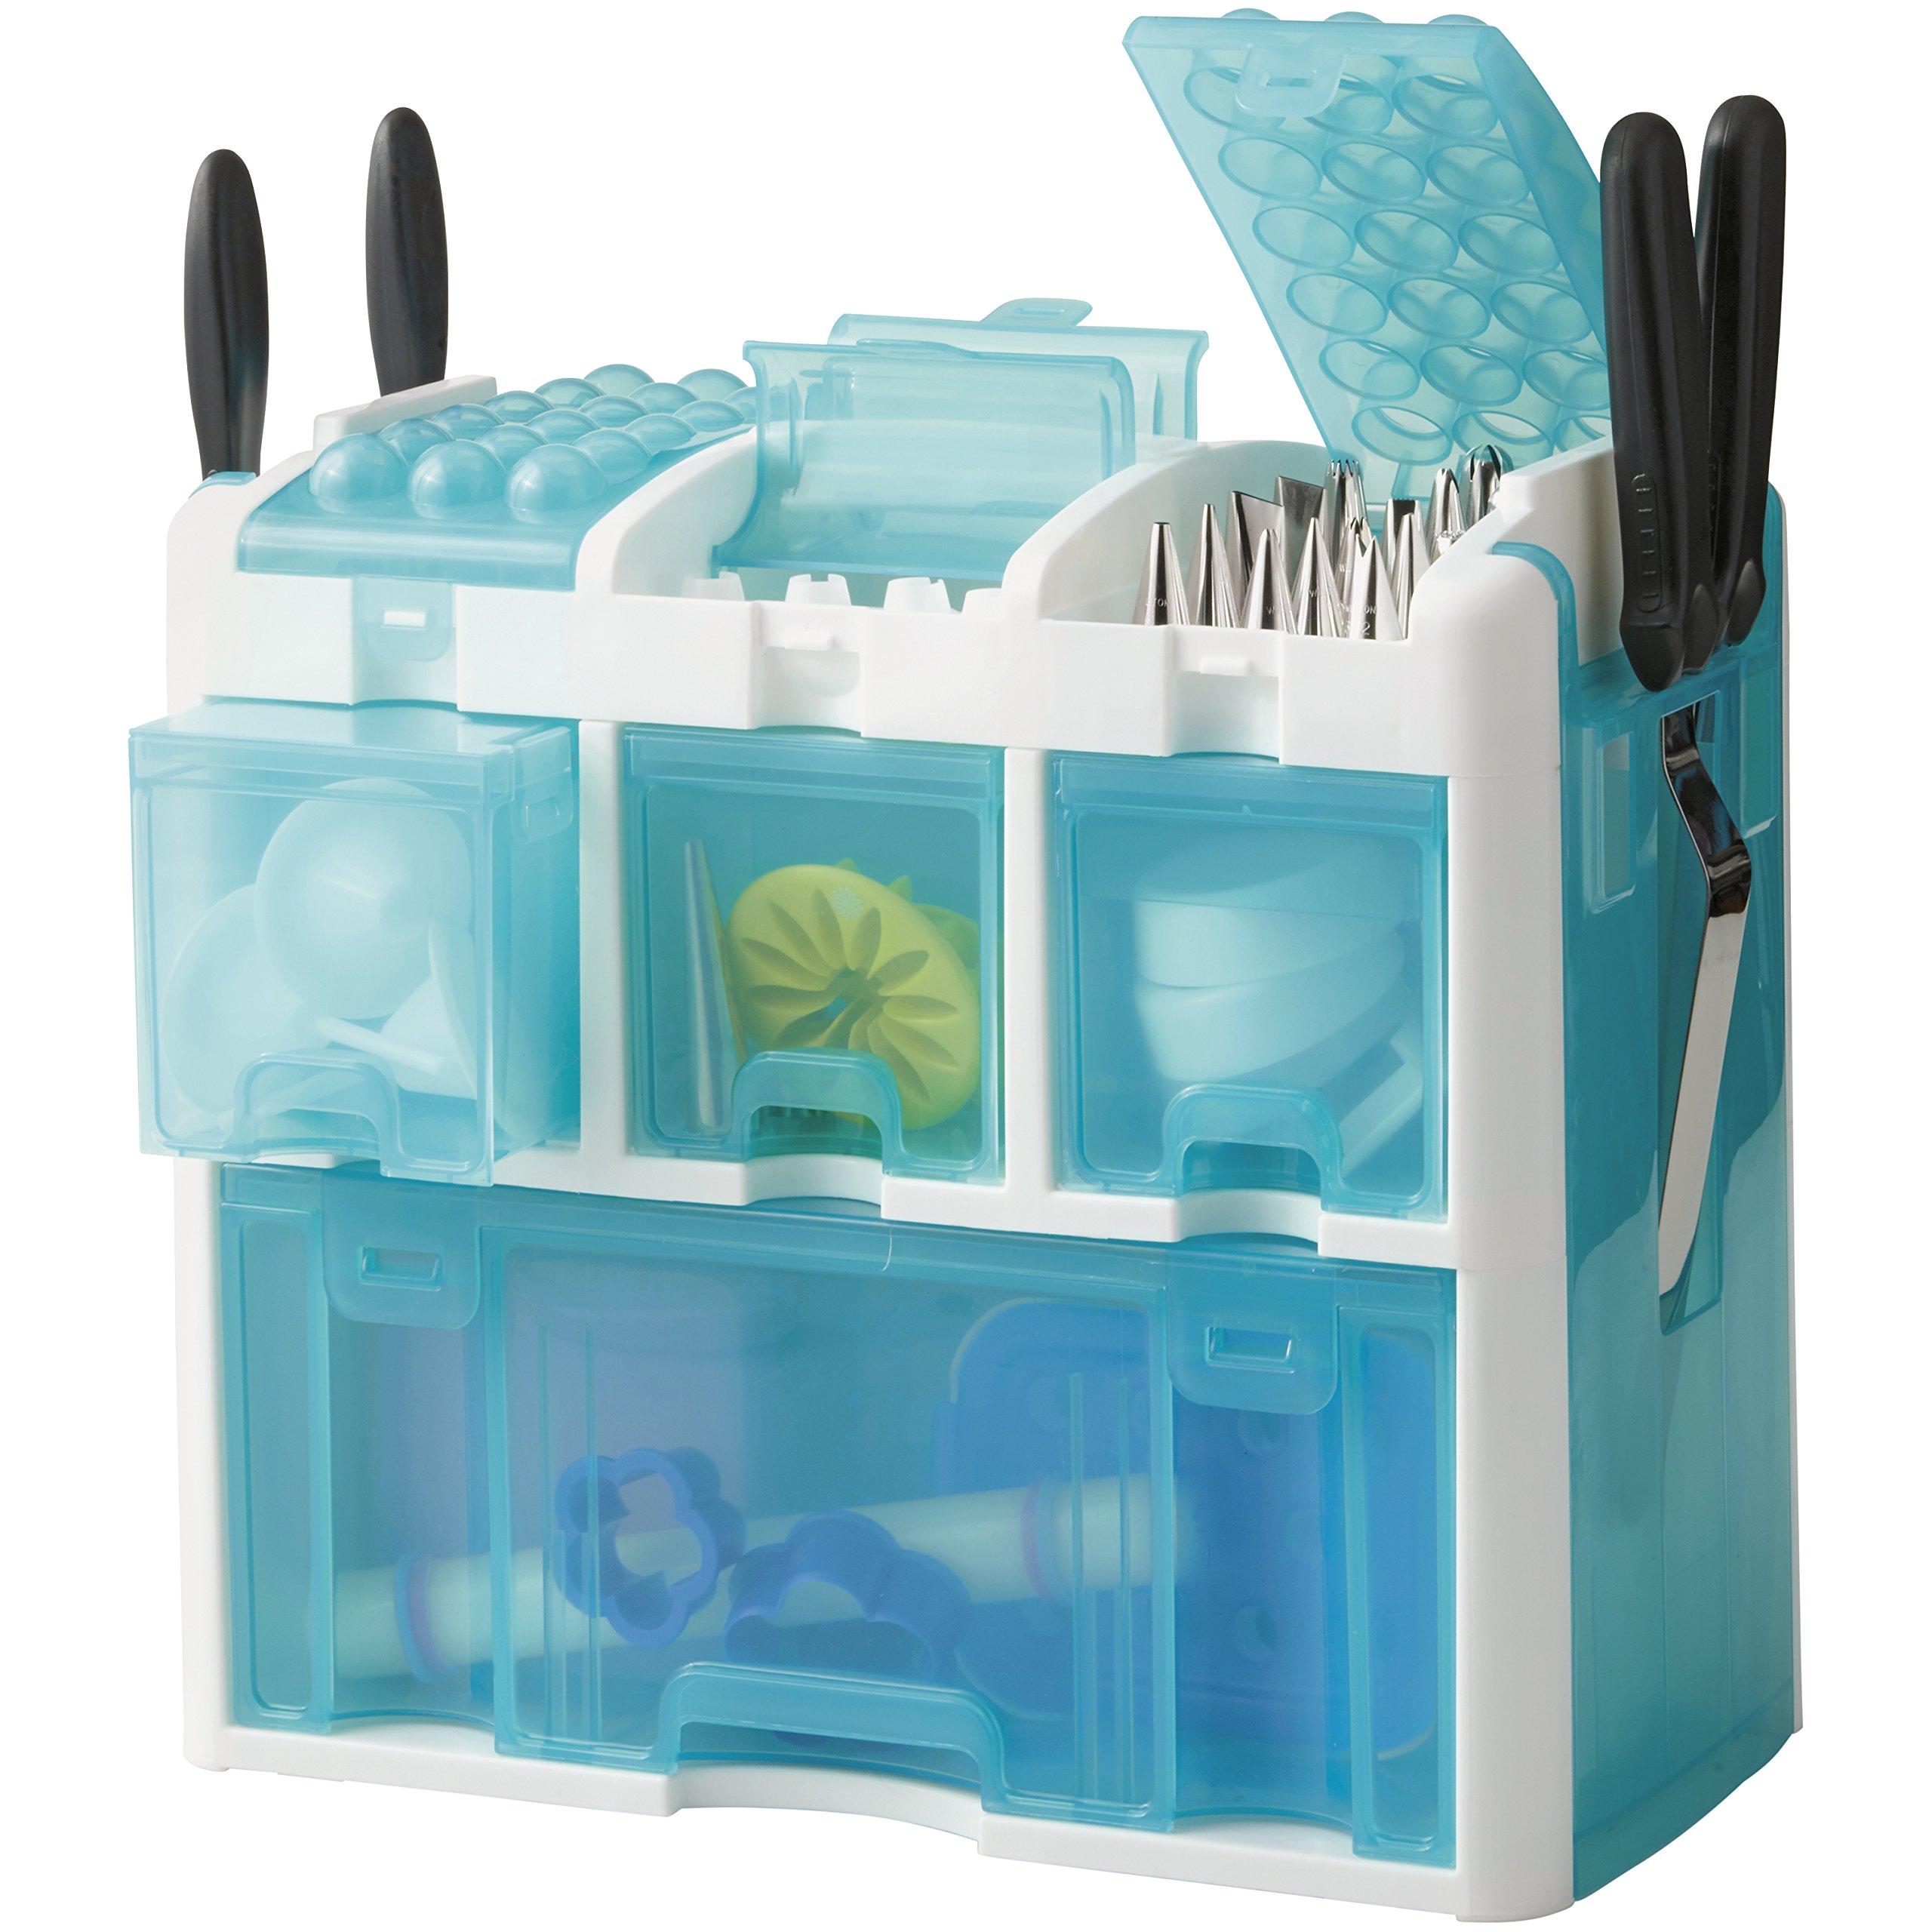 Wilton 2109-7245 Ultimate Decorating Set Tool Kit, Blue by Wilton (Image #4)